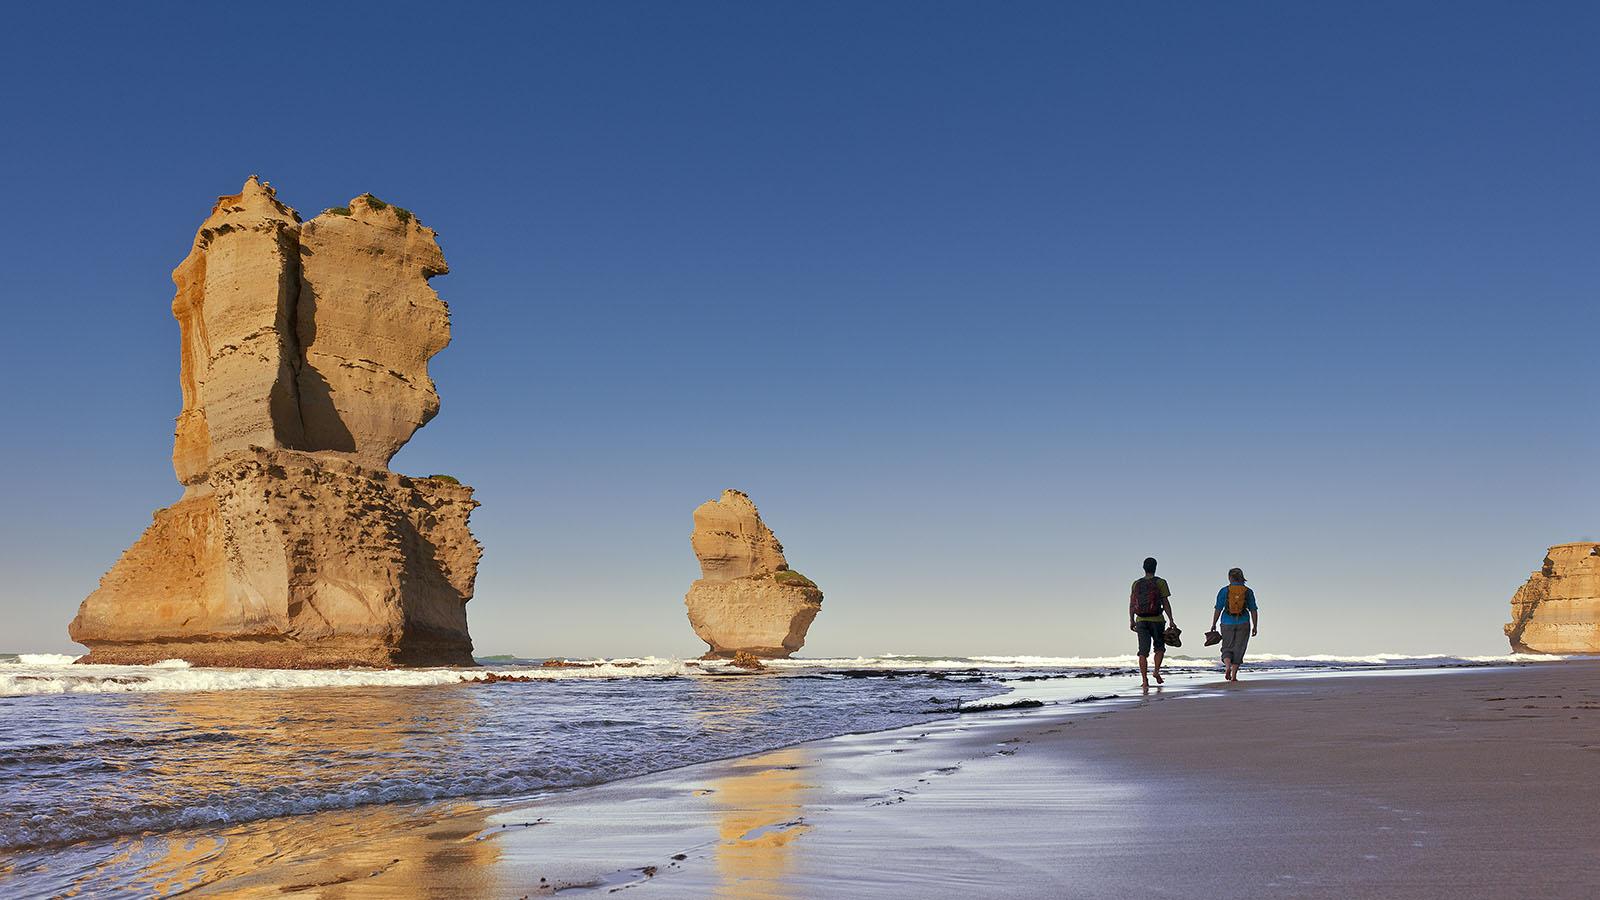 Couple walking past the 12 Apostles, Great Ocean Road, Victoria, Australia